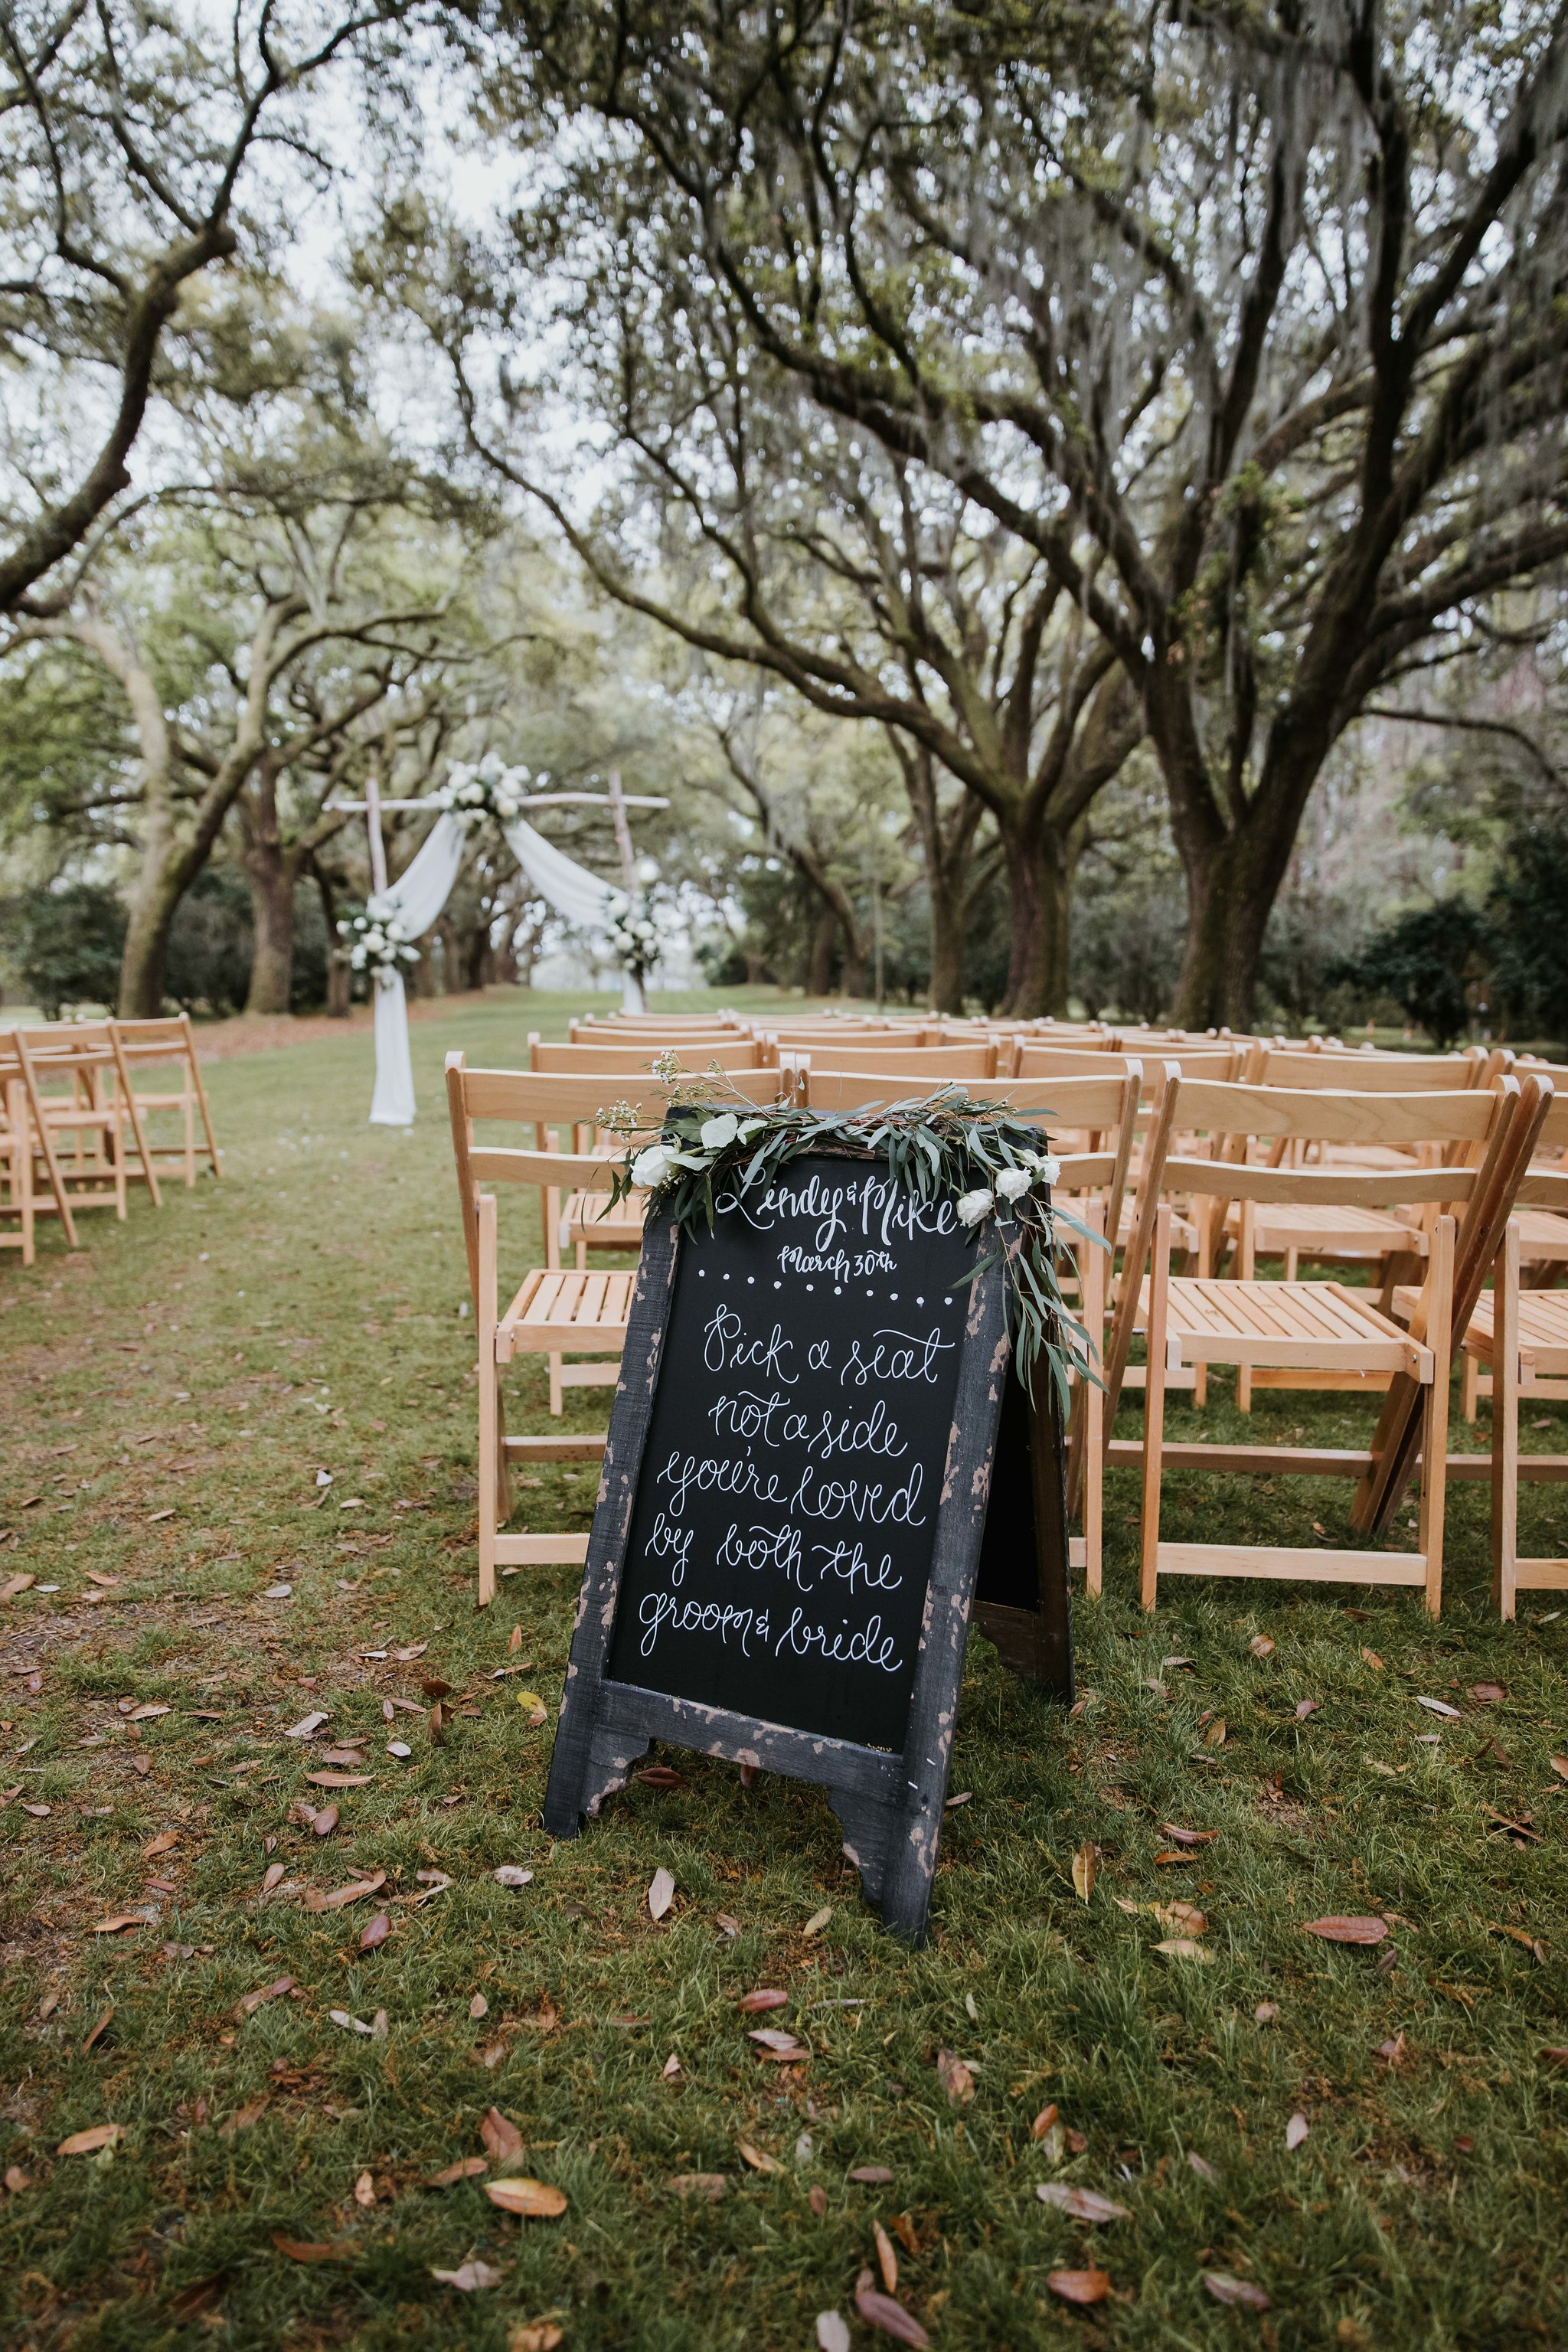 Legare-Waring-House-Charleston-SC-wedding-portrait-photography-91.jpg